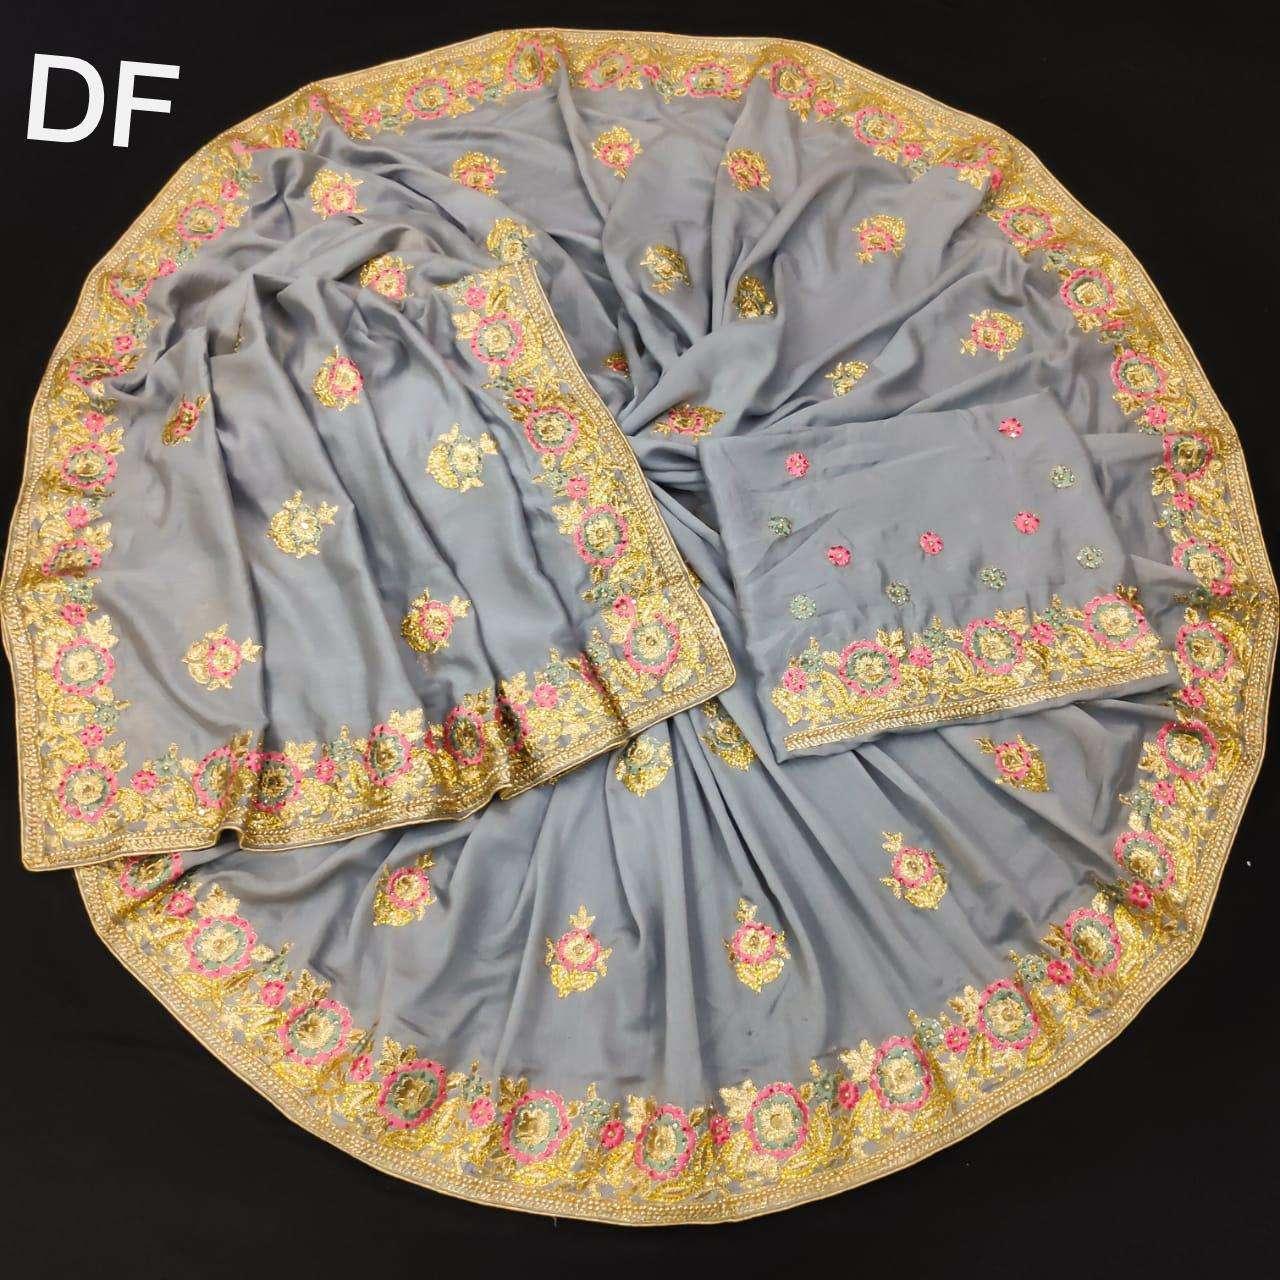 Df 4024 Vichitra Silk Georgette With Multi Embroidery Zari Work Sarees Collection 3